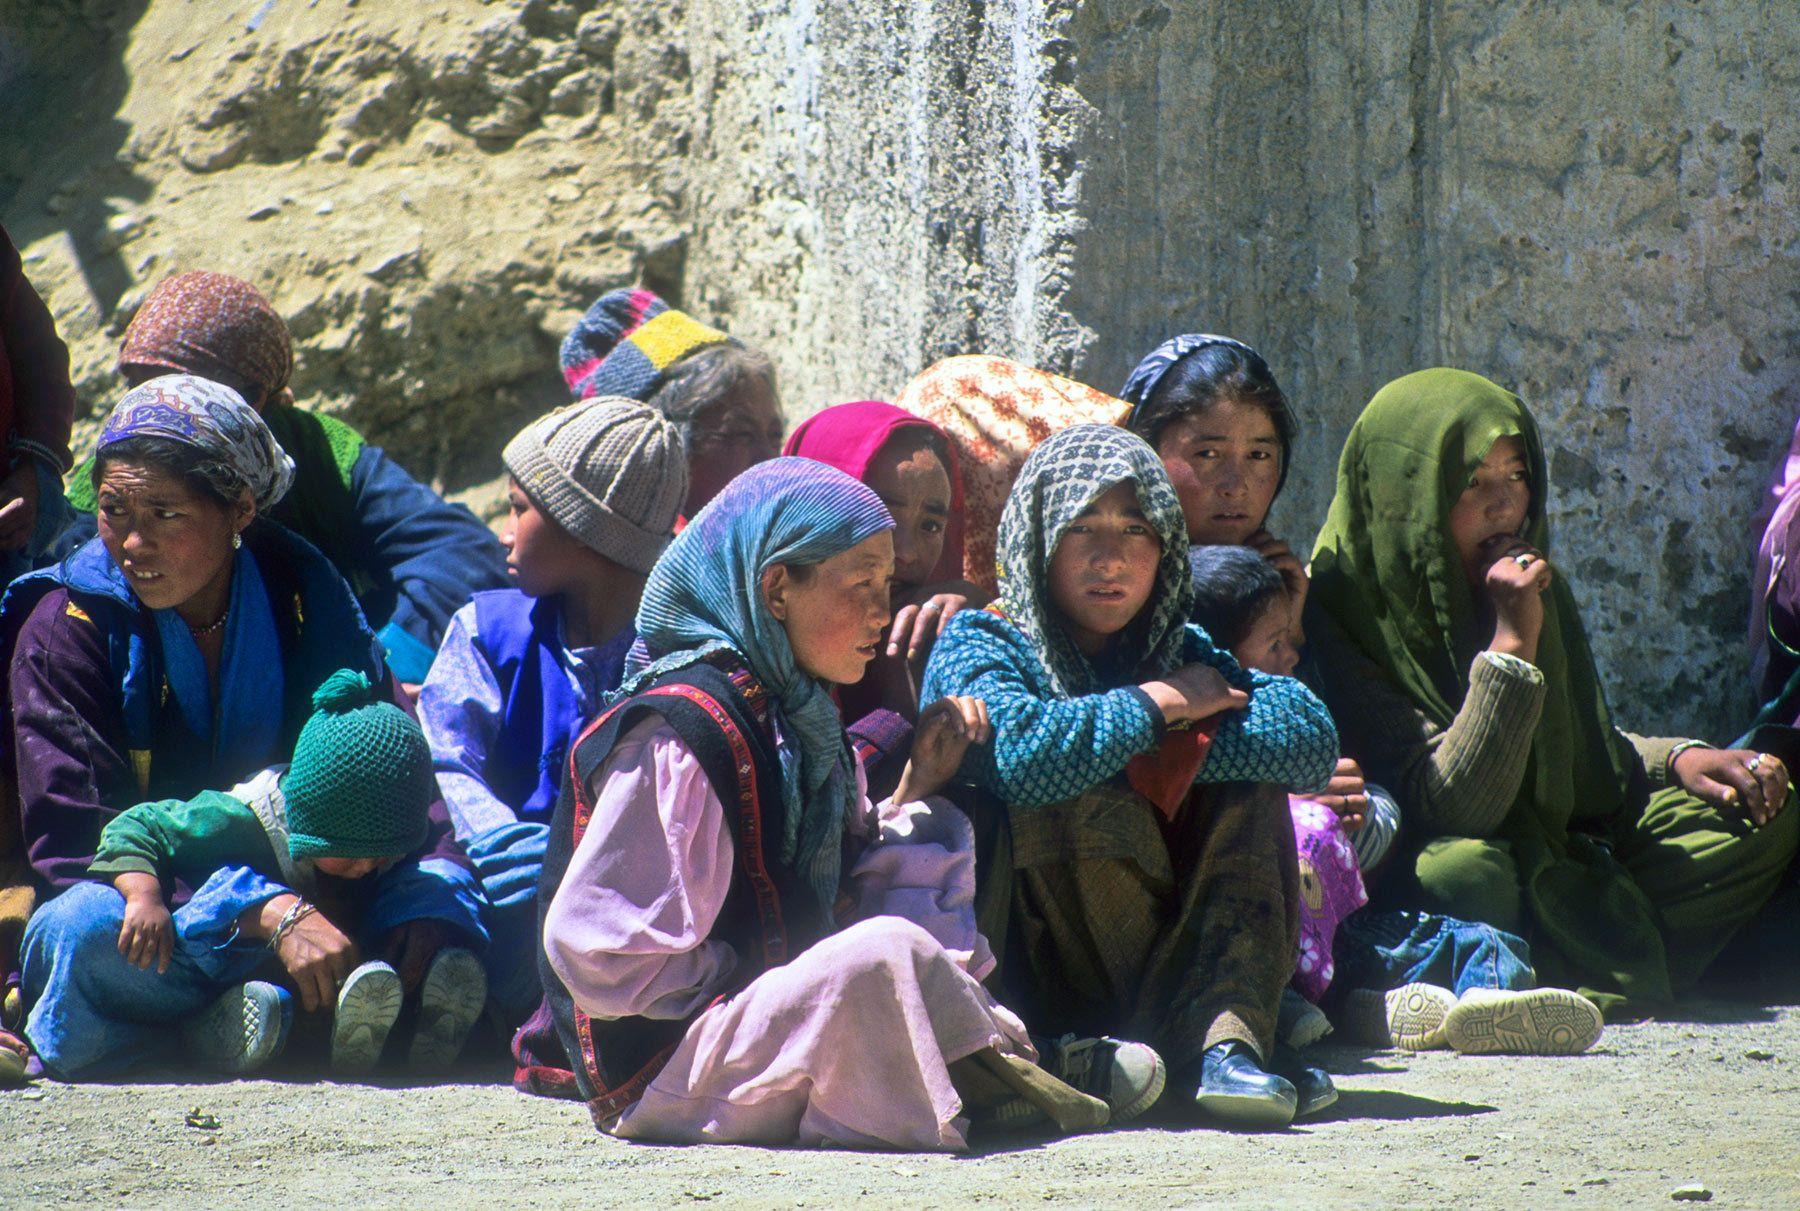 Villagers at Buddhist festival, Ladakh Region, India